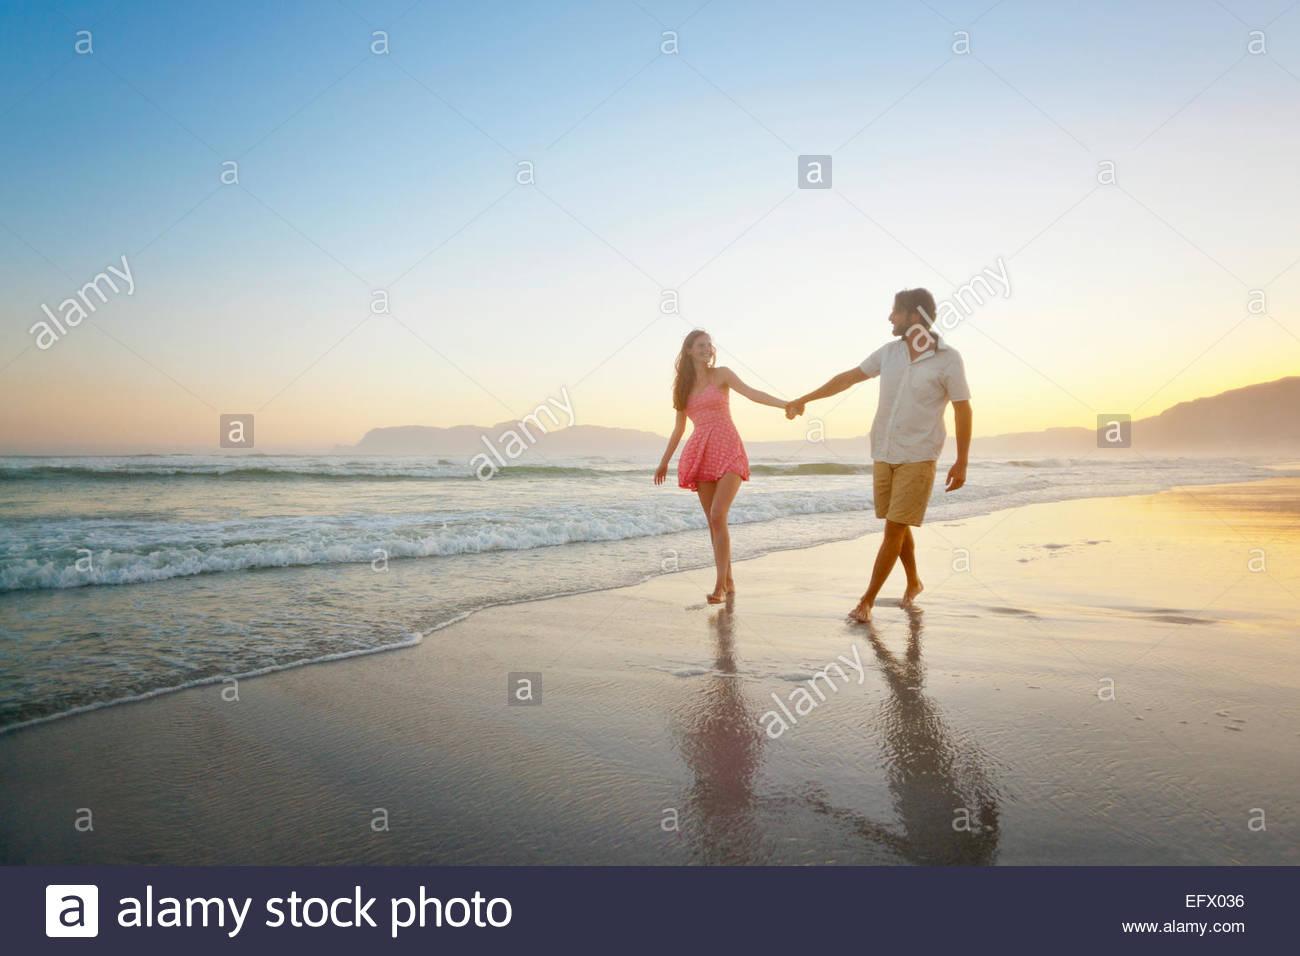 Couple, holding hands, walking along sunny beach - Stock Image